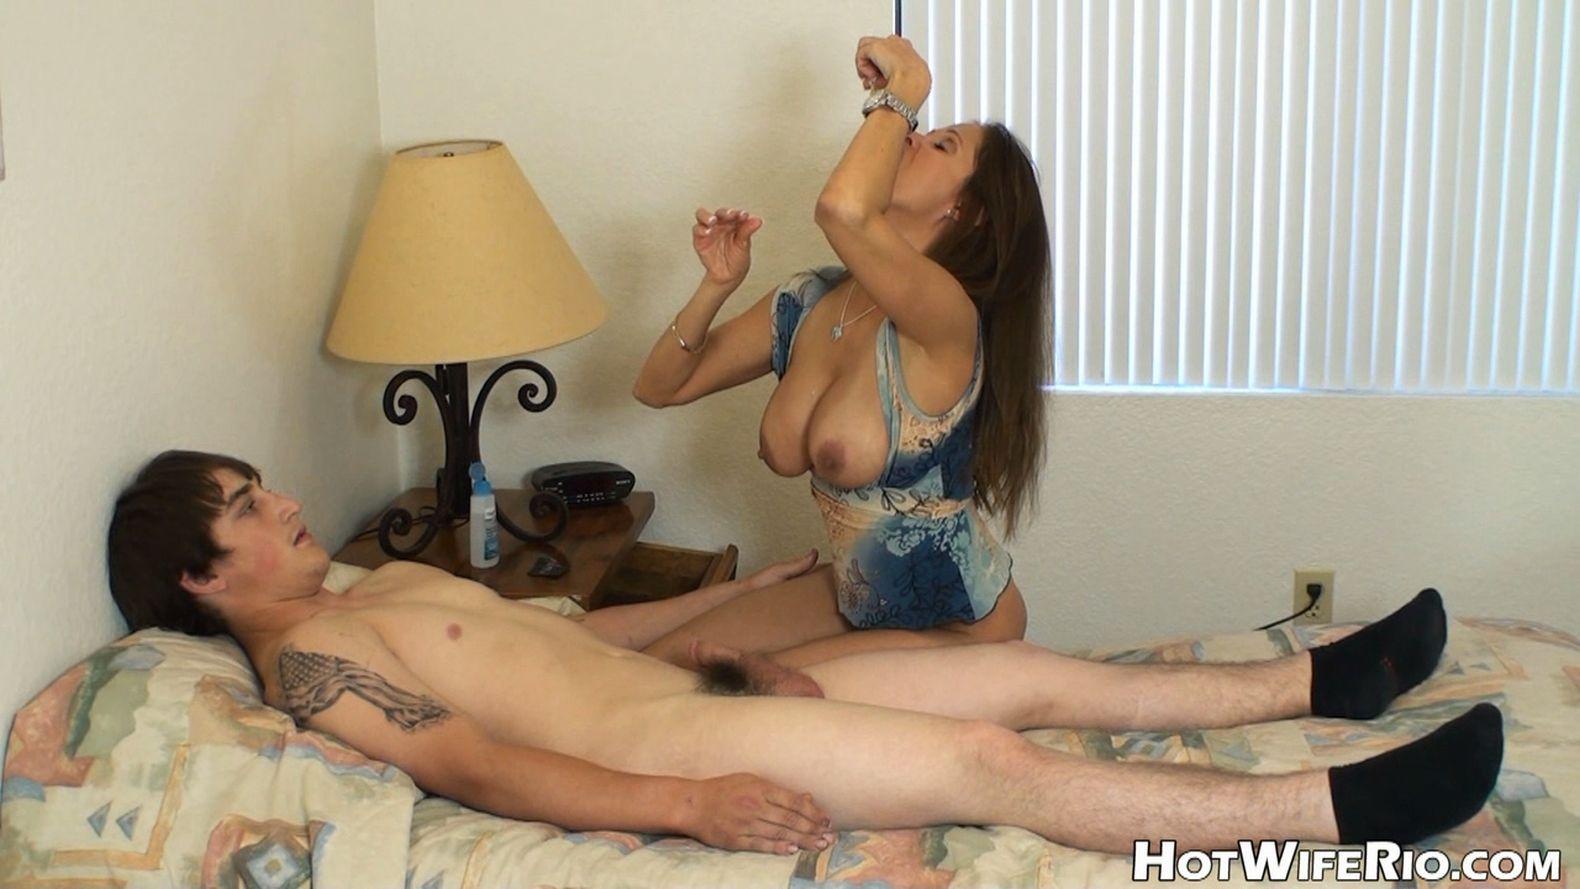 Mini clip of porn stars having sex